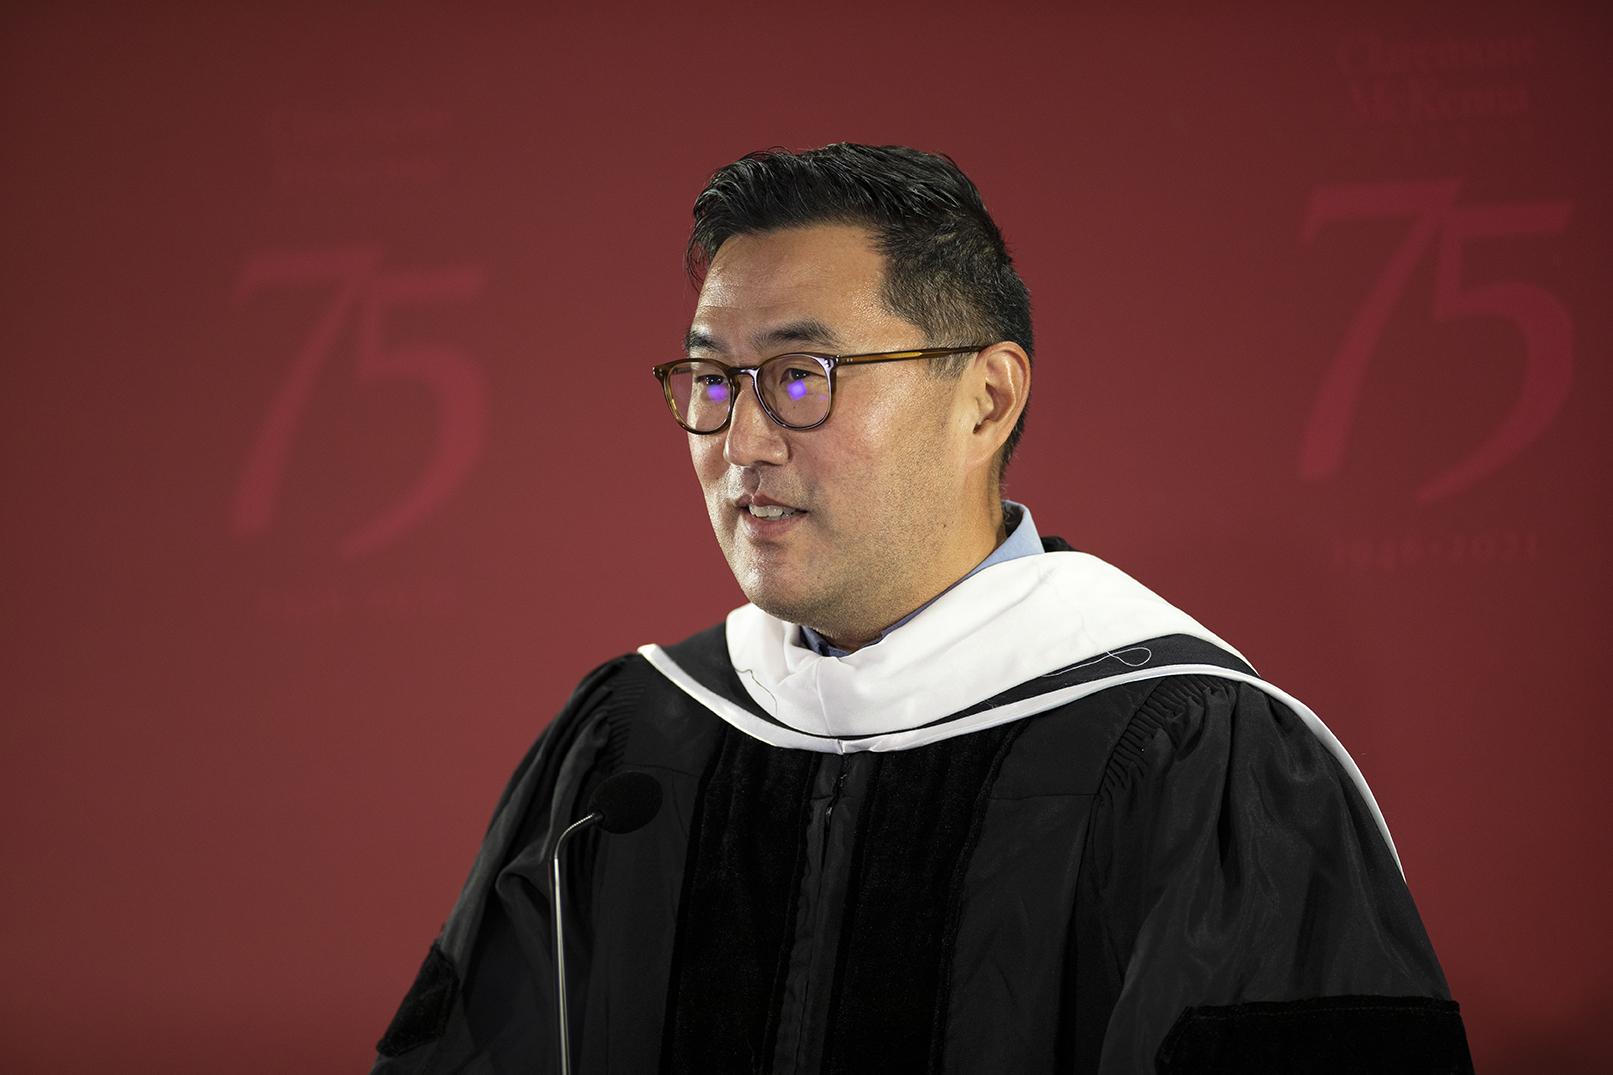 Albert L. Park, Bank of America Associate Professor of Pacific Basin Studies, delivers his keynote address